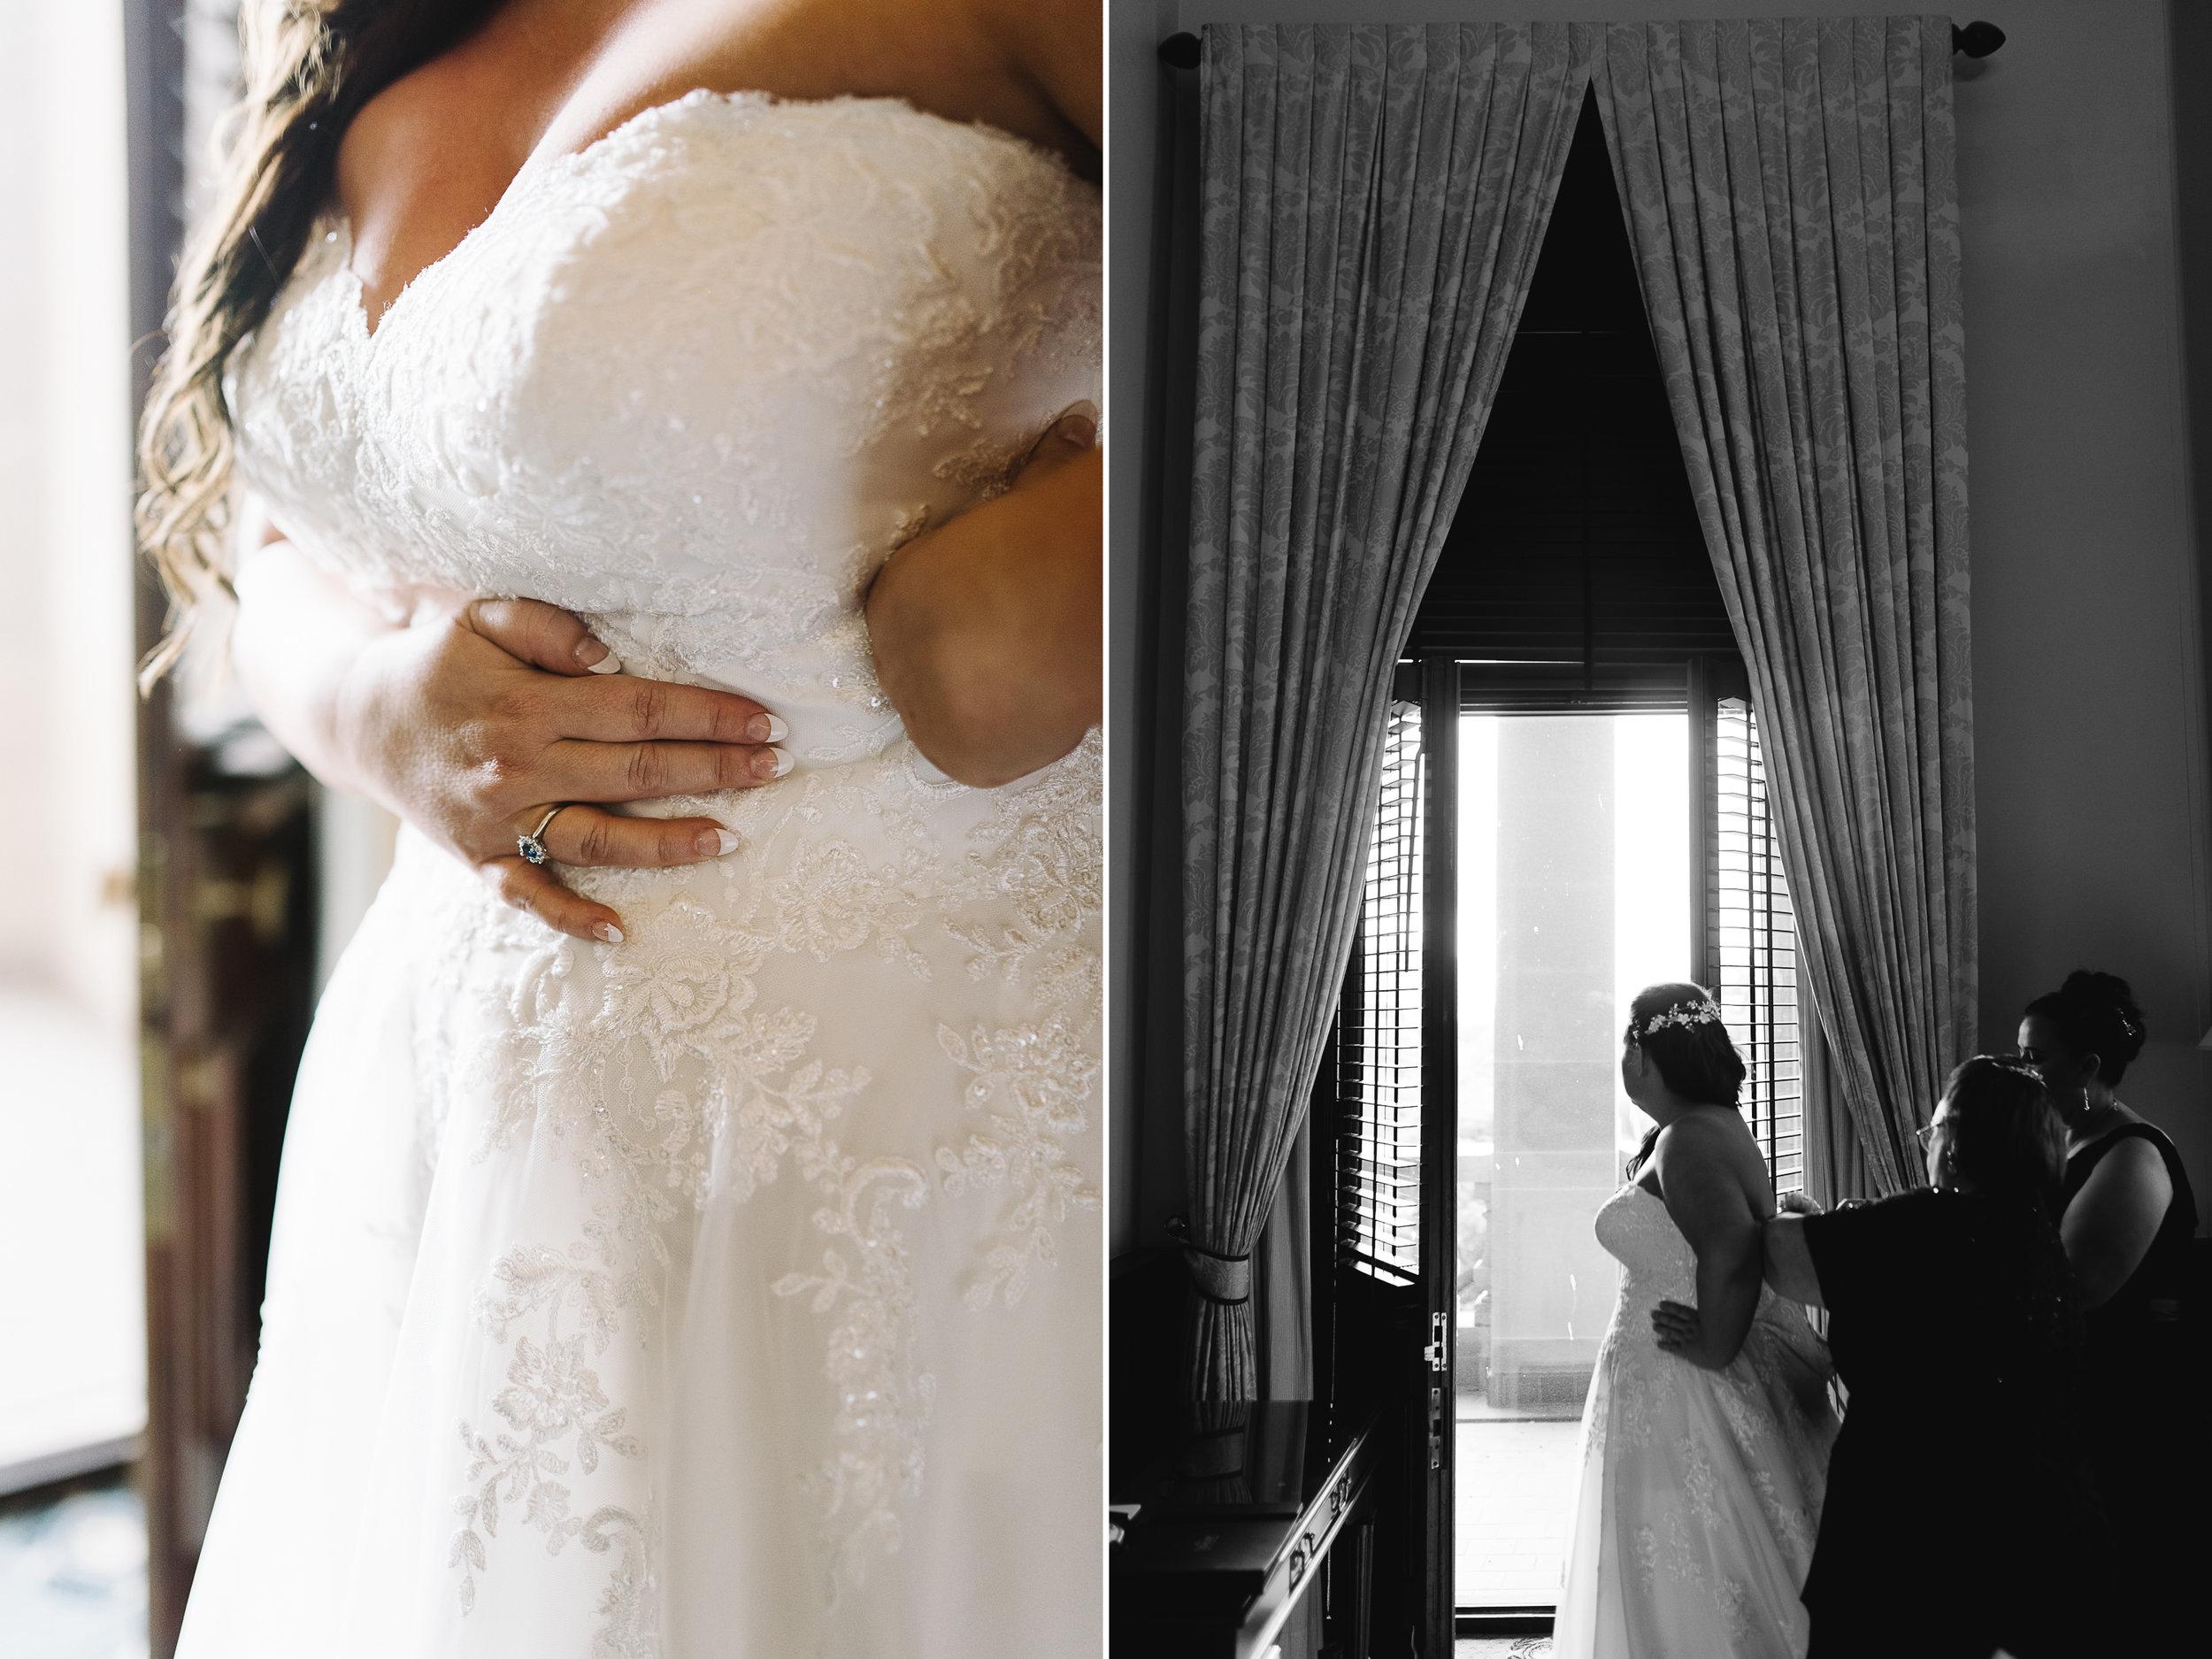 nudgee-college-wedding-7.jpg